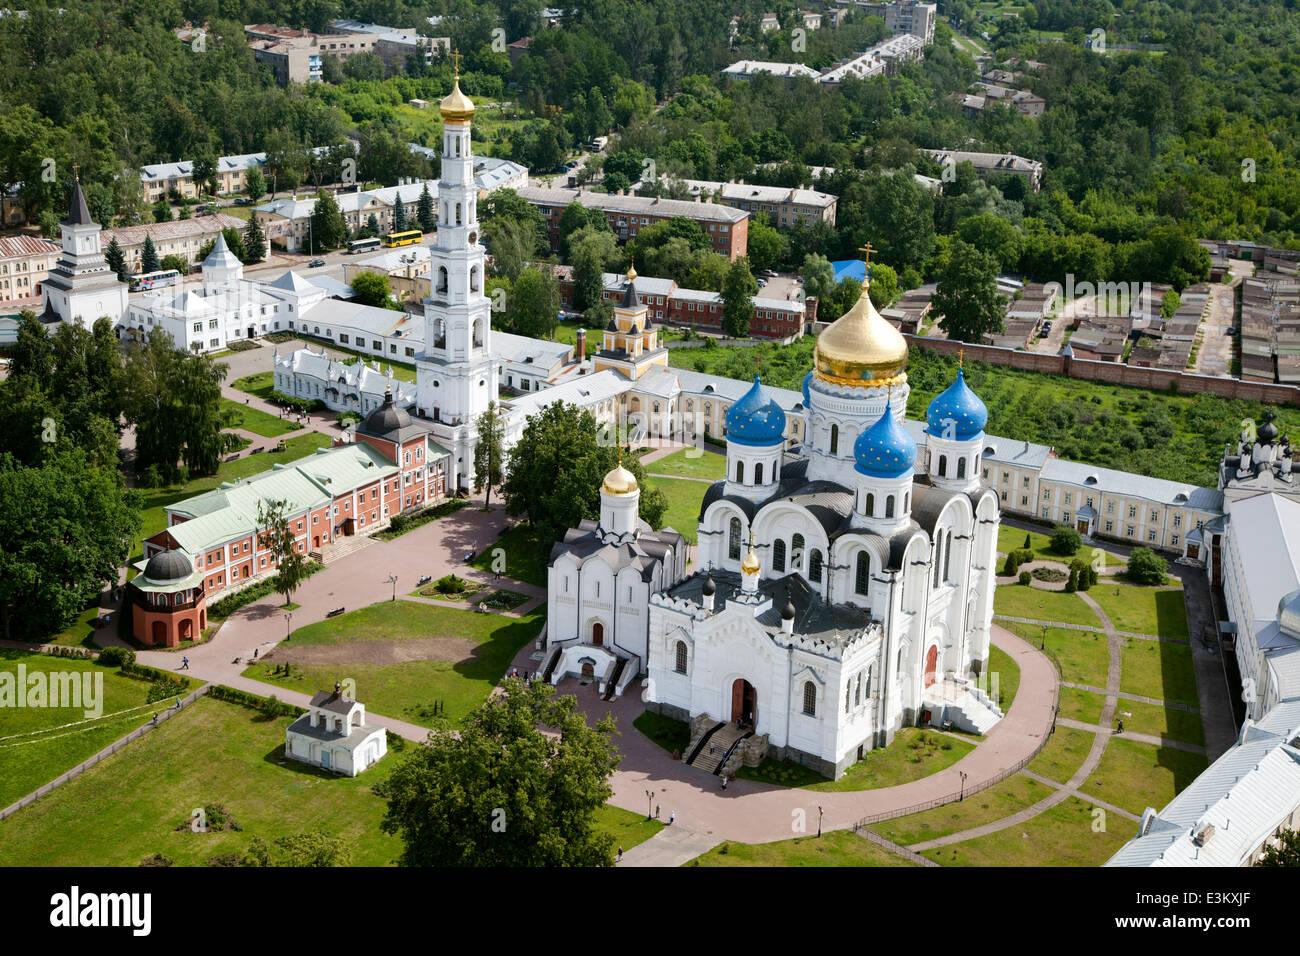 Aerial view of Saint Nicholas Ugreshsky monastery in Moscow region, Dzerzhinsky town, Russia - Stock Image